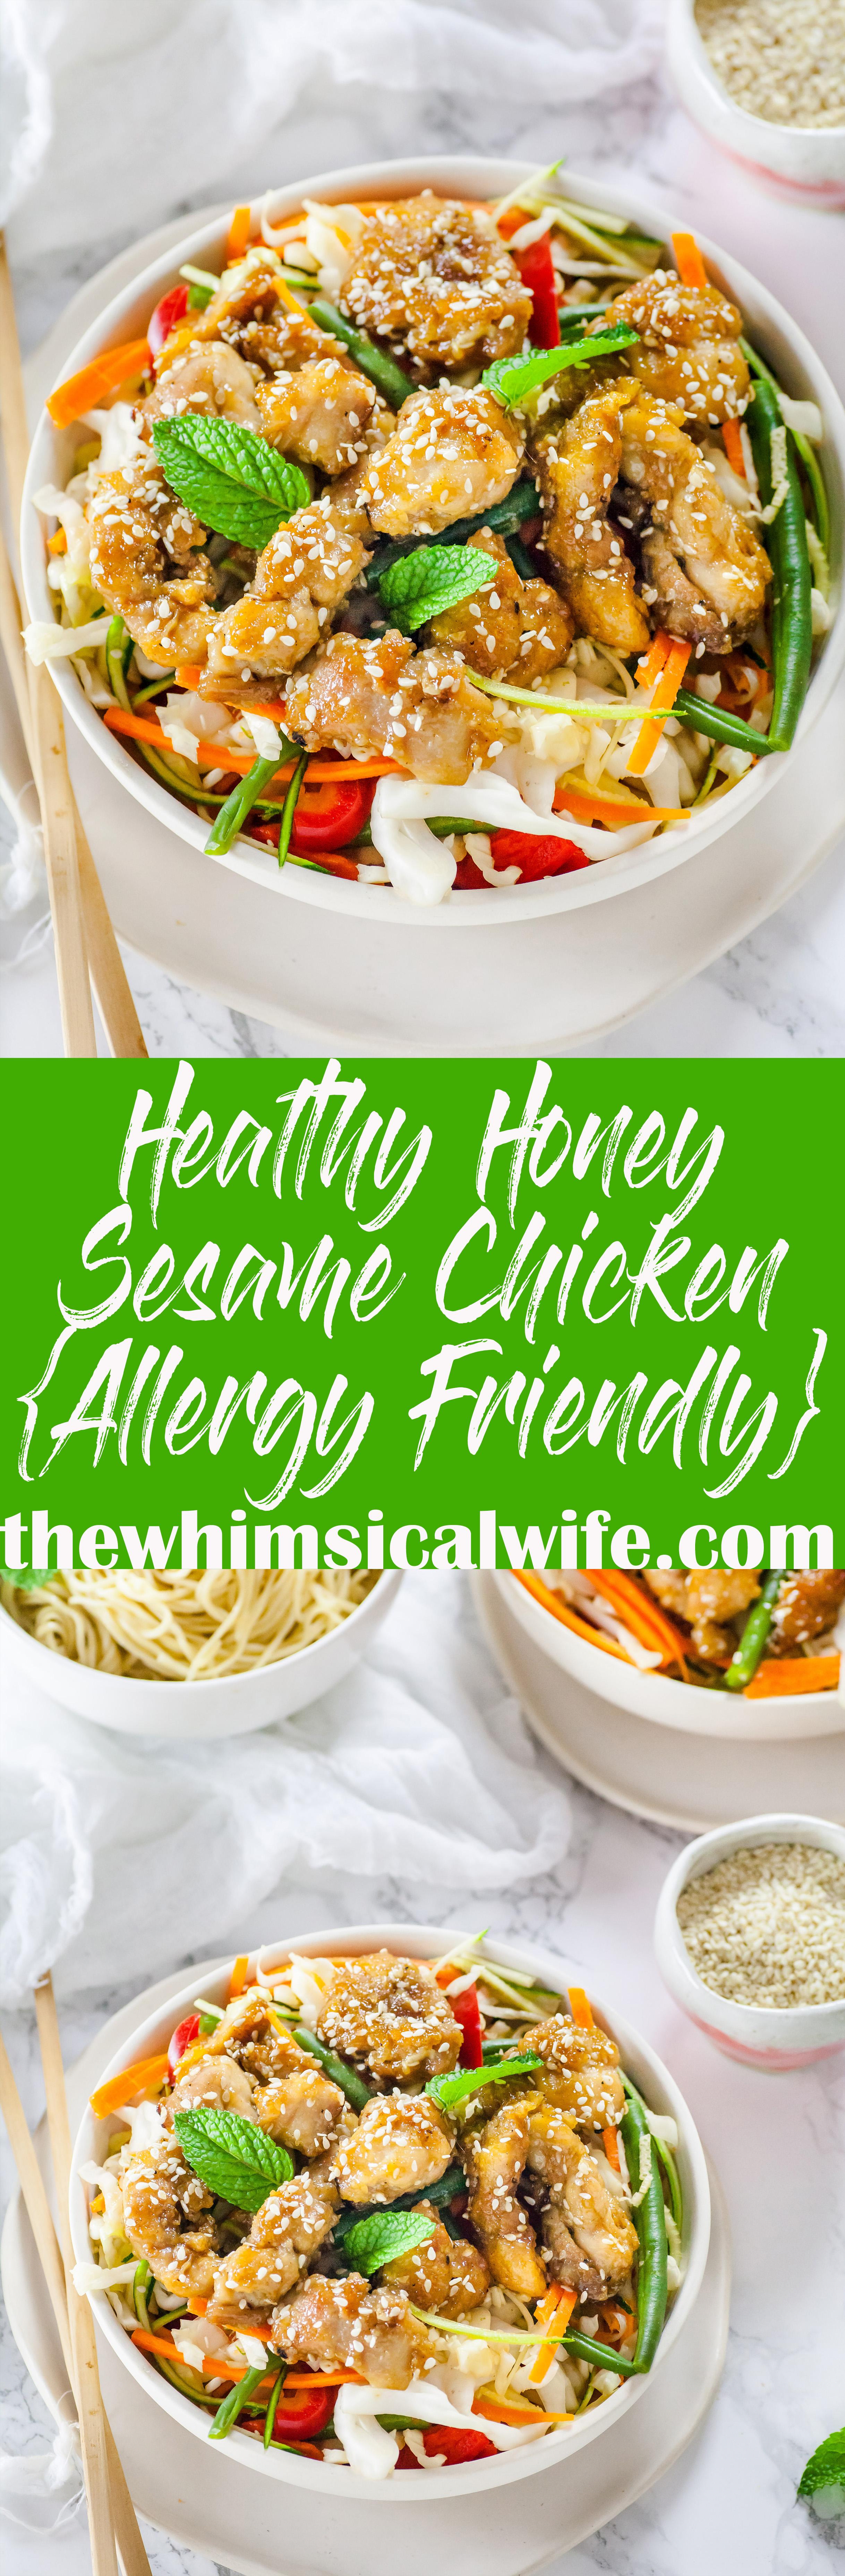 Healthy Honey Sesame Chicken { GF, DF, Nut & Egg Free}